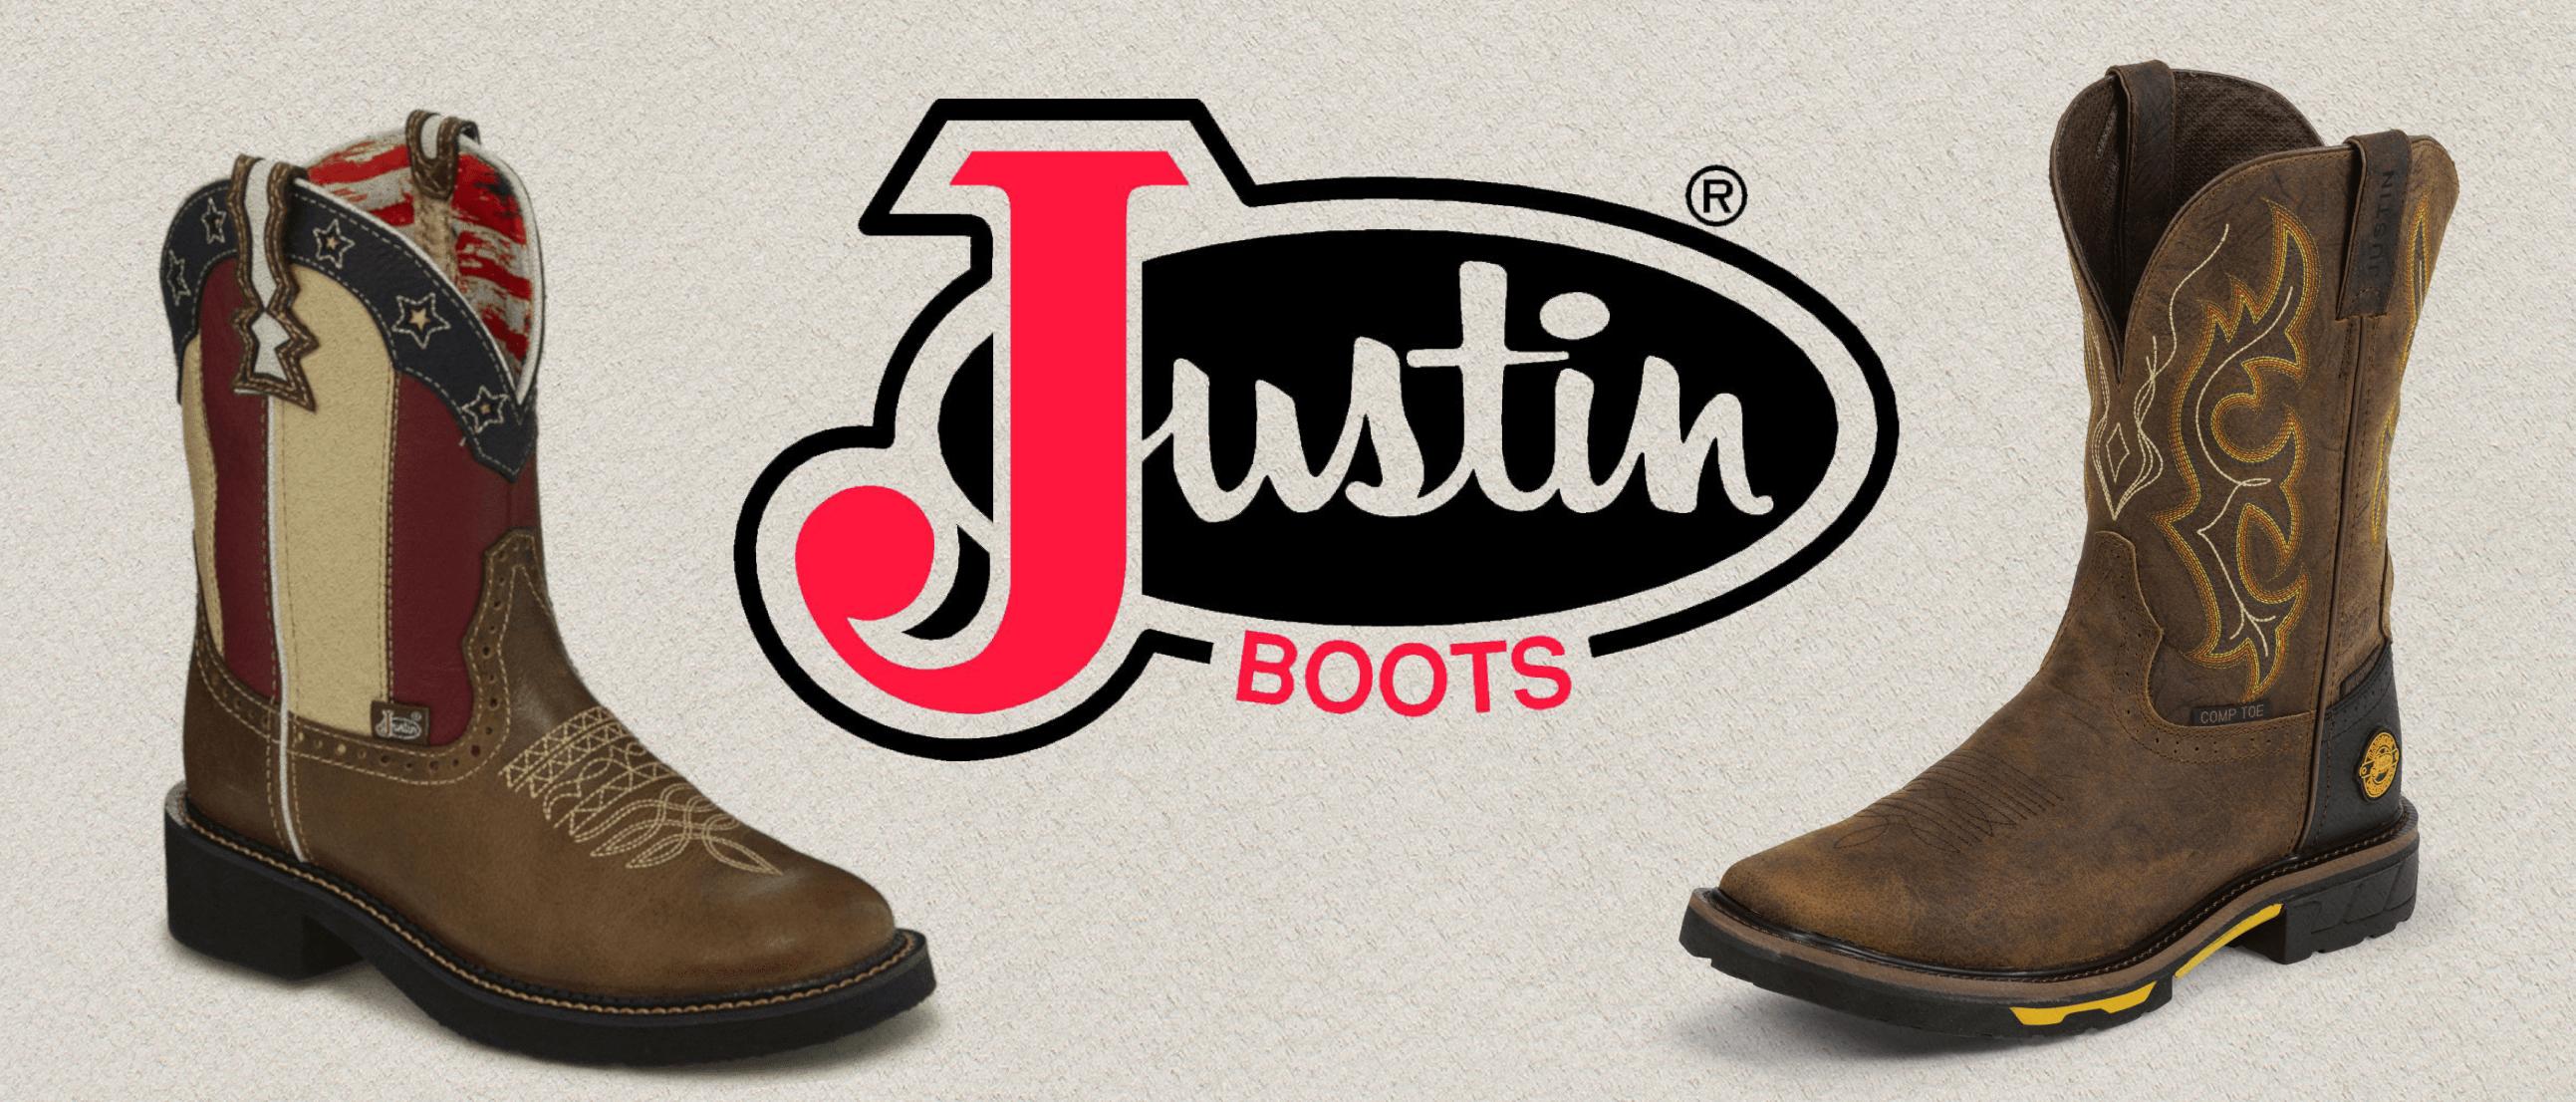 justin-boots-banner.jpg